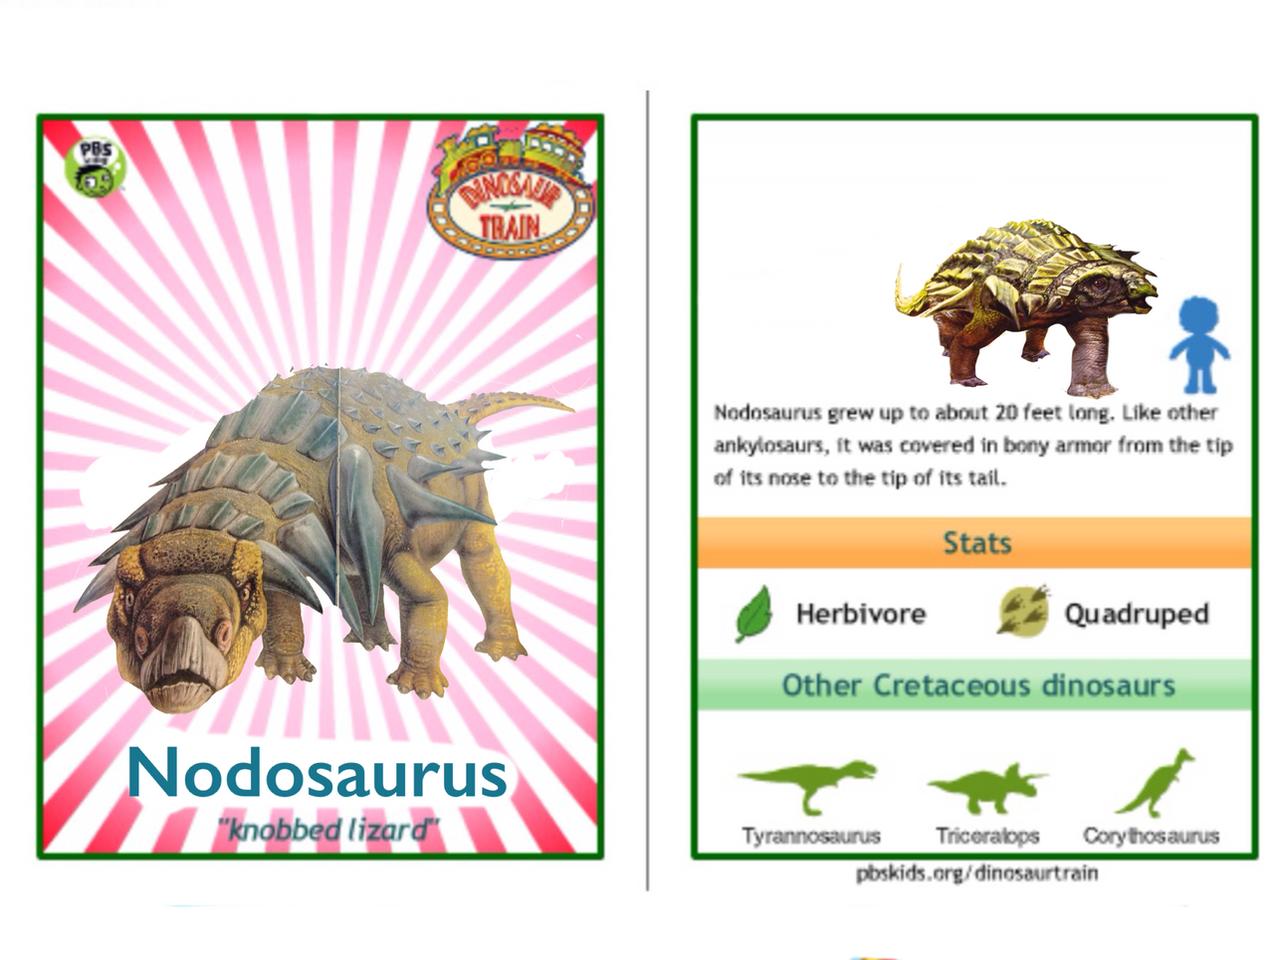 Dinosaur Train Nodosaurus card by Vespisaurus on DeviantArt